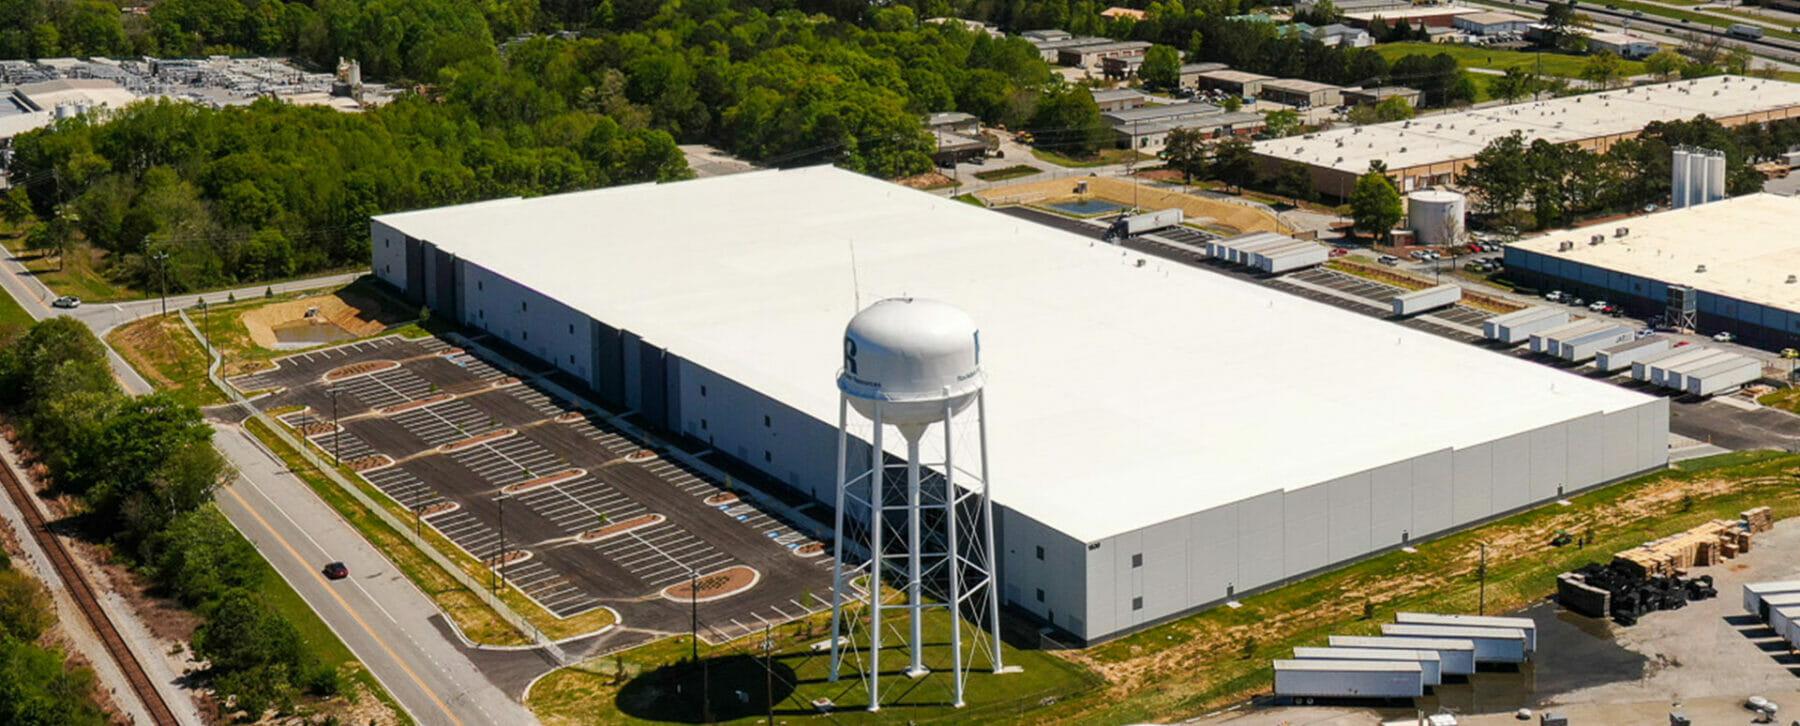 BioLab Warehouse - Conyers, GA 1